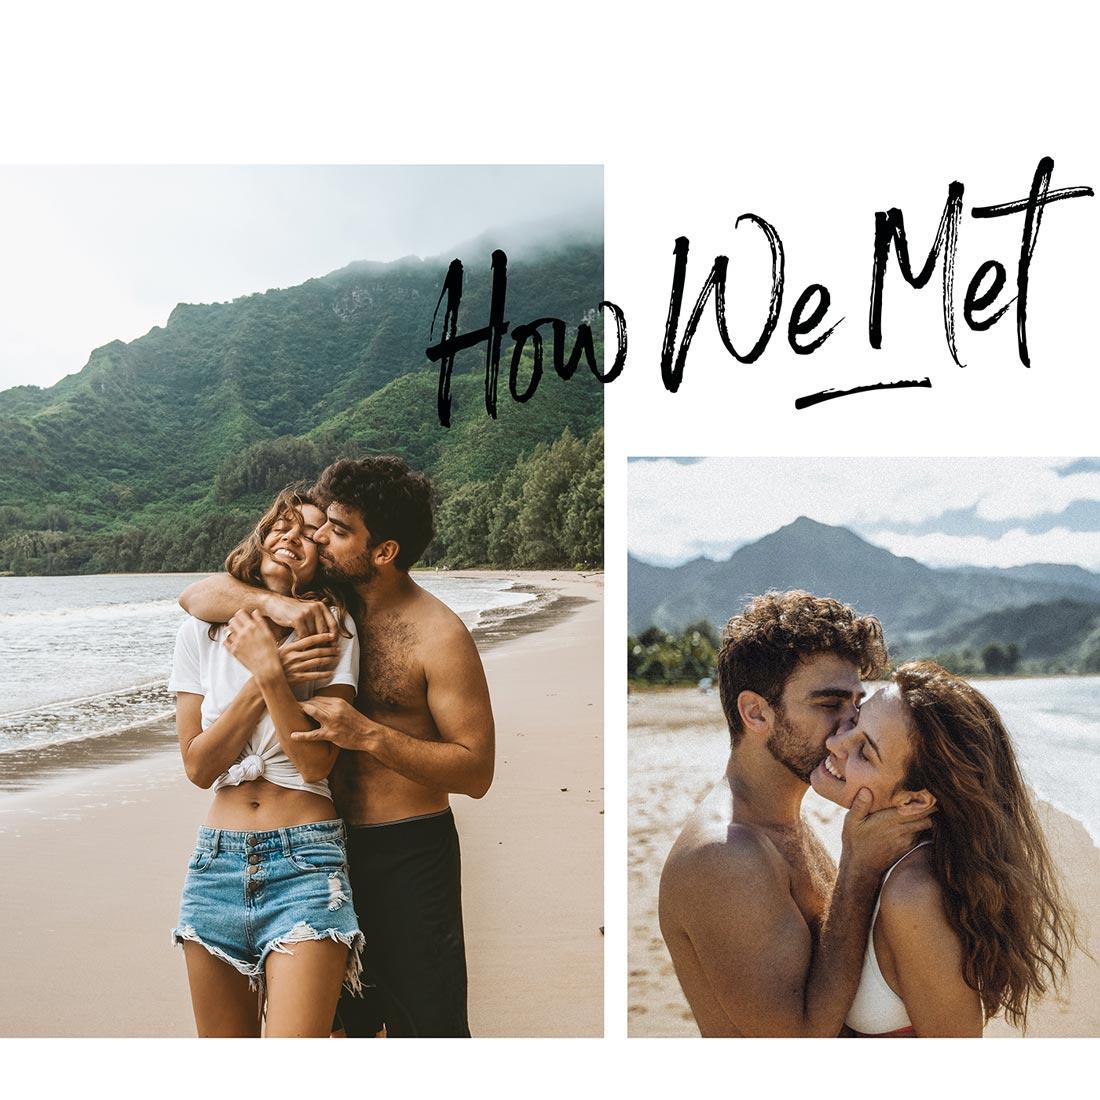 katerina-yinon-how-we-met-2